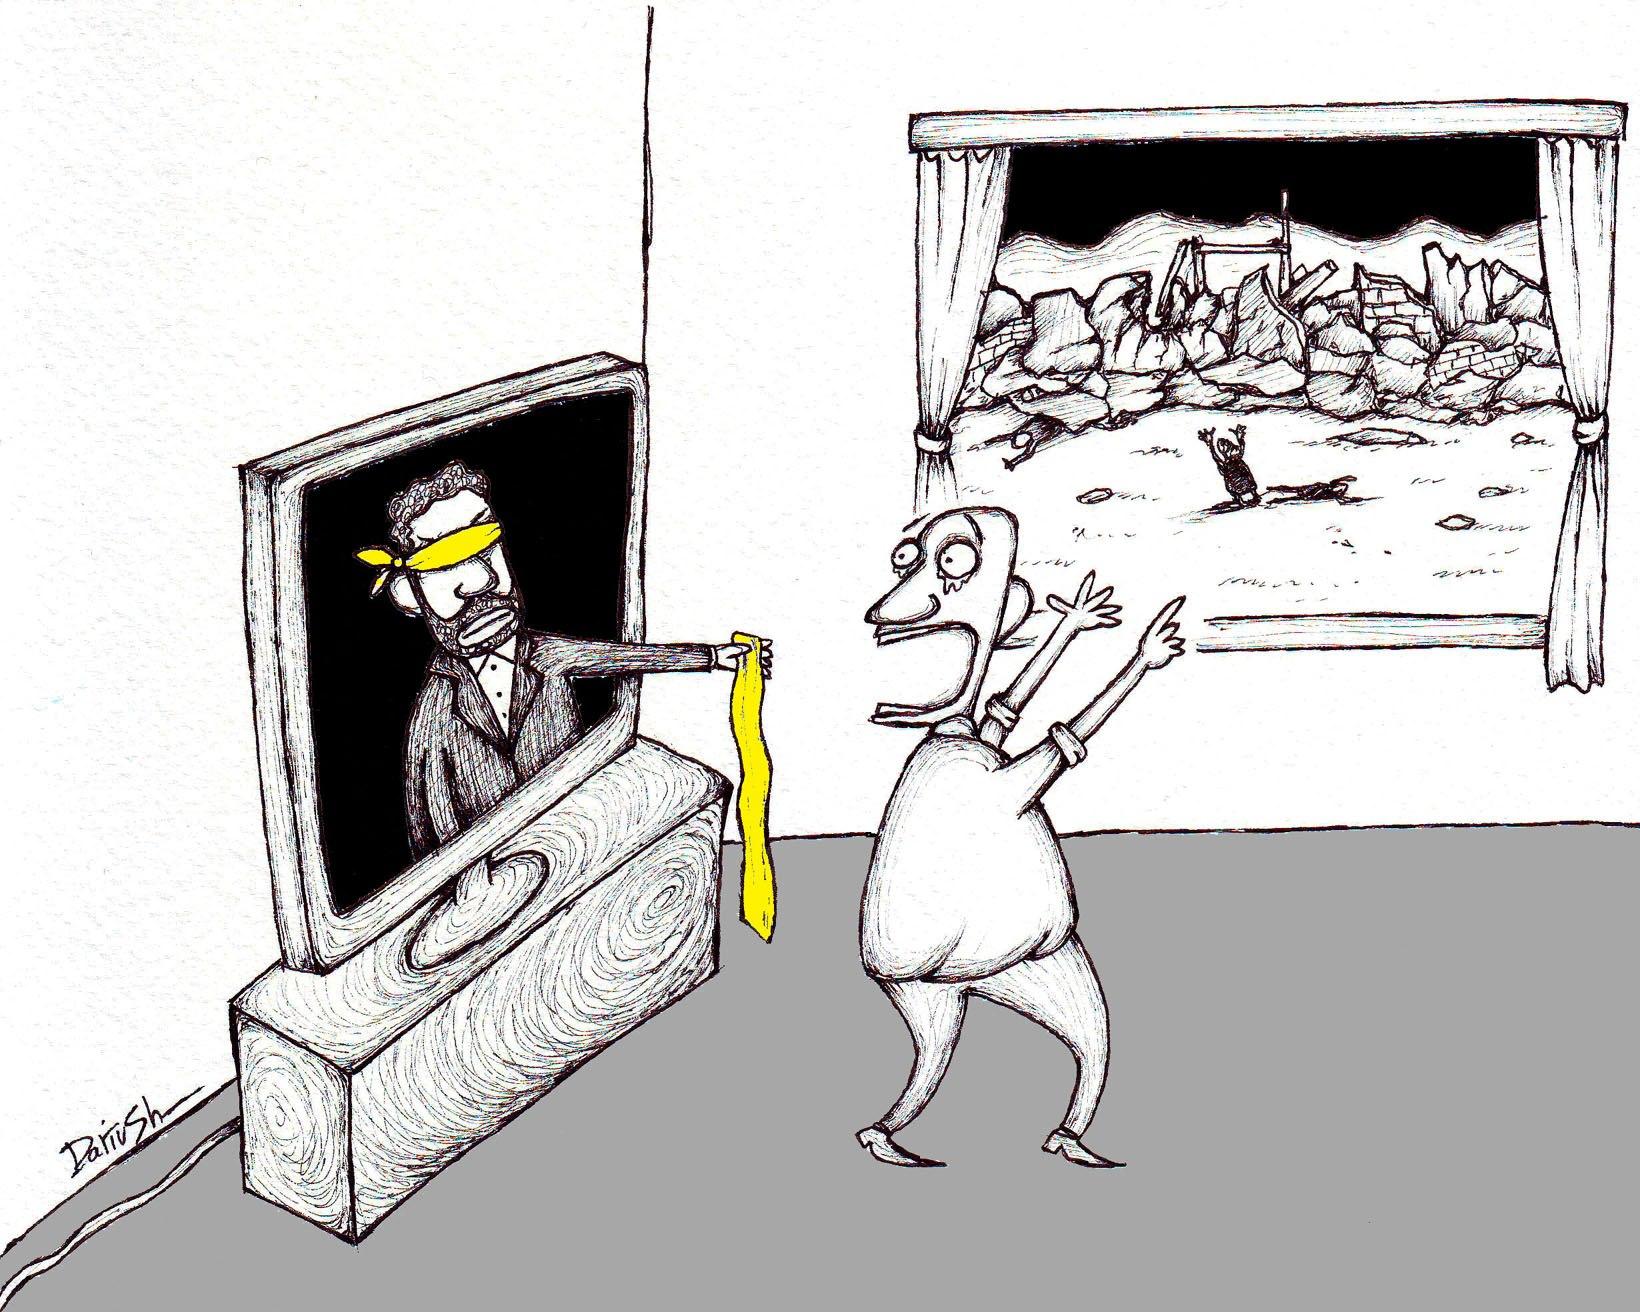 Drioush0111 کاریکاتور تازهای از داریوش رمضانی